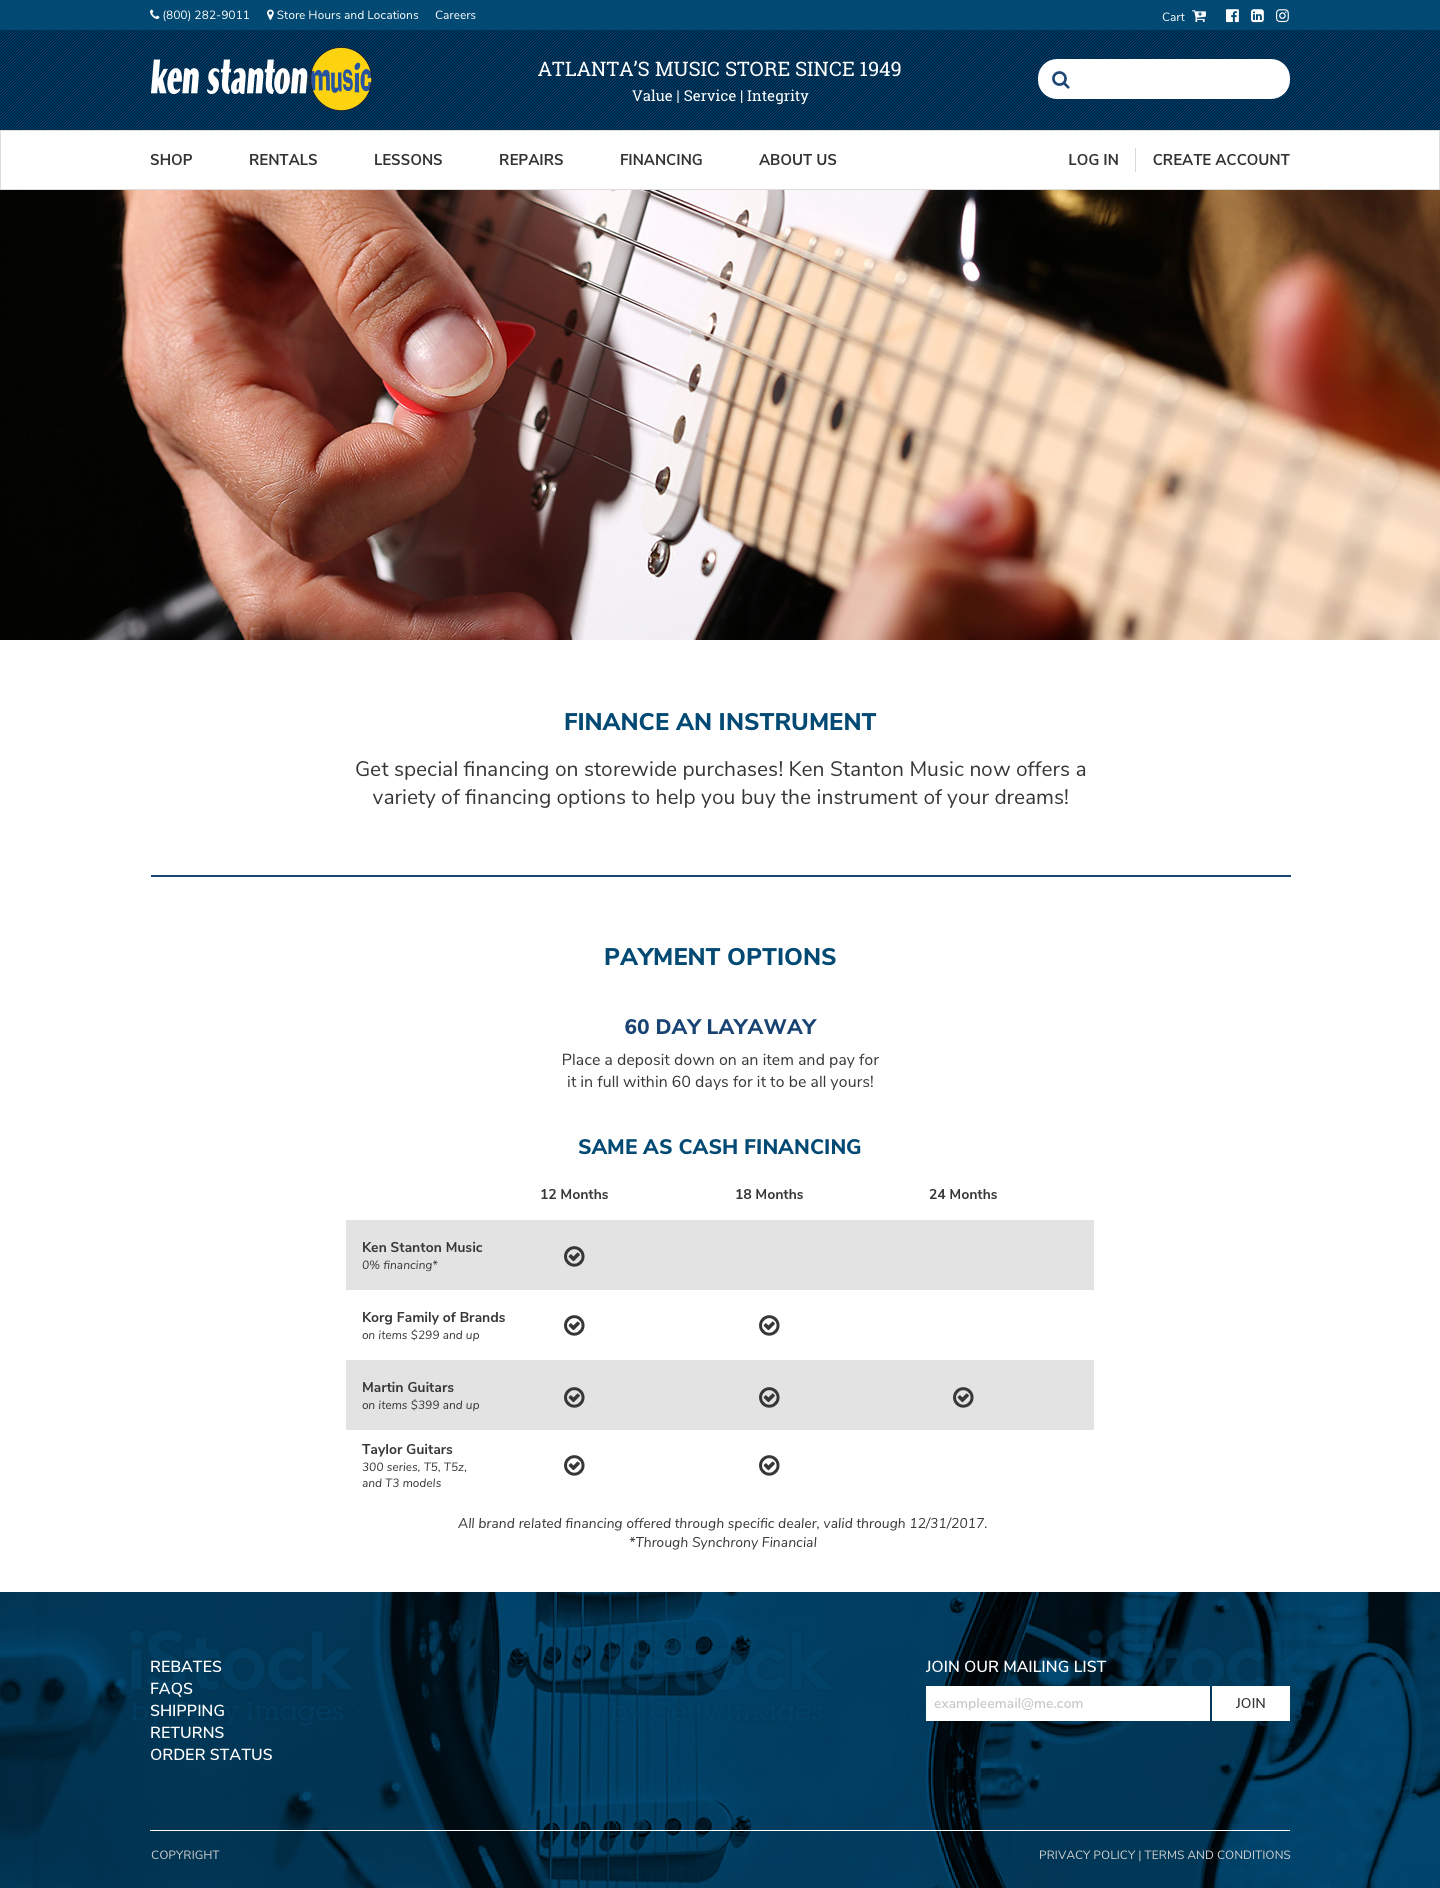 v3-Finance-an-Instrument-Desktop.jpg